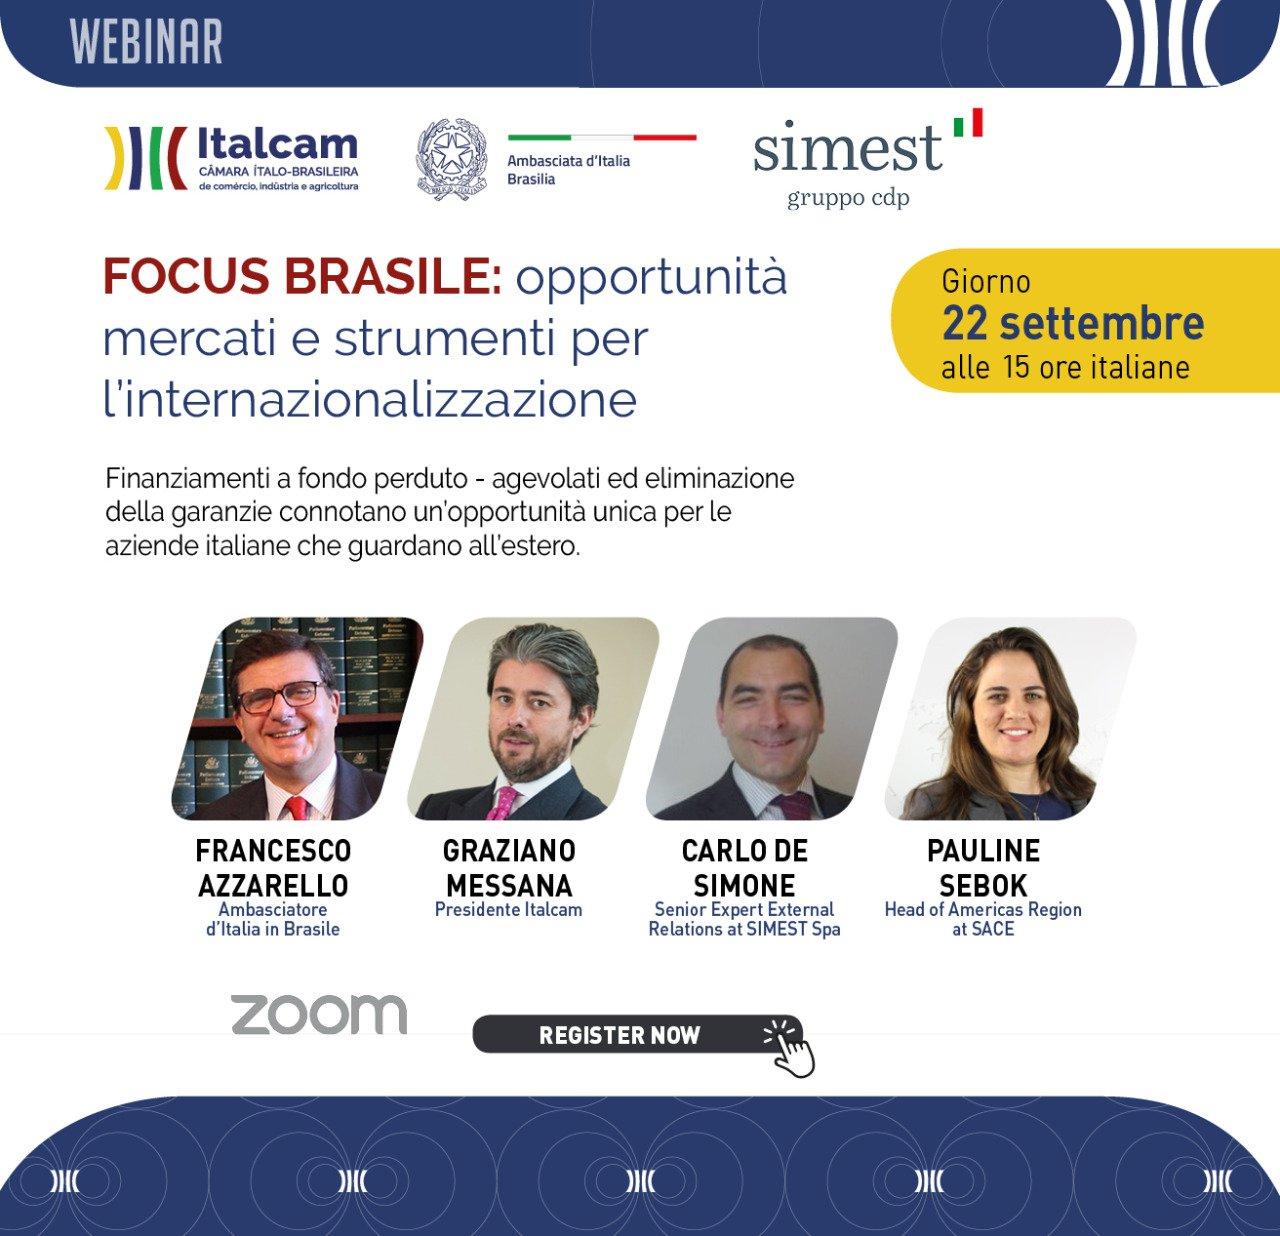 Focus Brasile: opportunità mercati e strumenti per l'internazionalizzazione